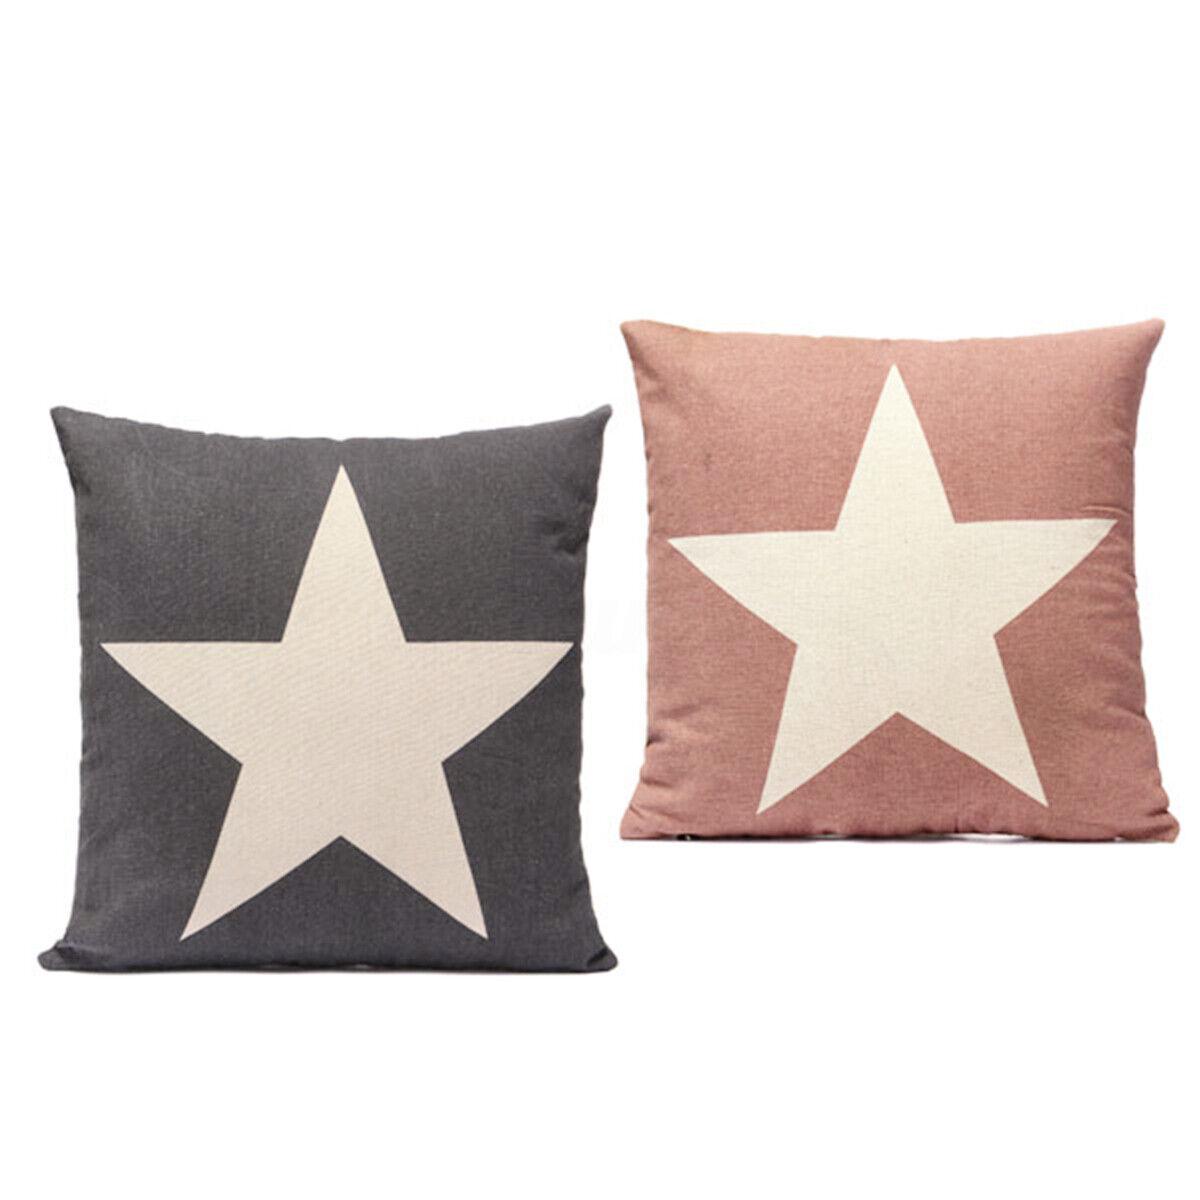 42x42cm Pillow Case Linen Waist Throw Sofa Back Home Car Seat Cushion Home & Garden